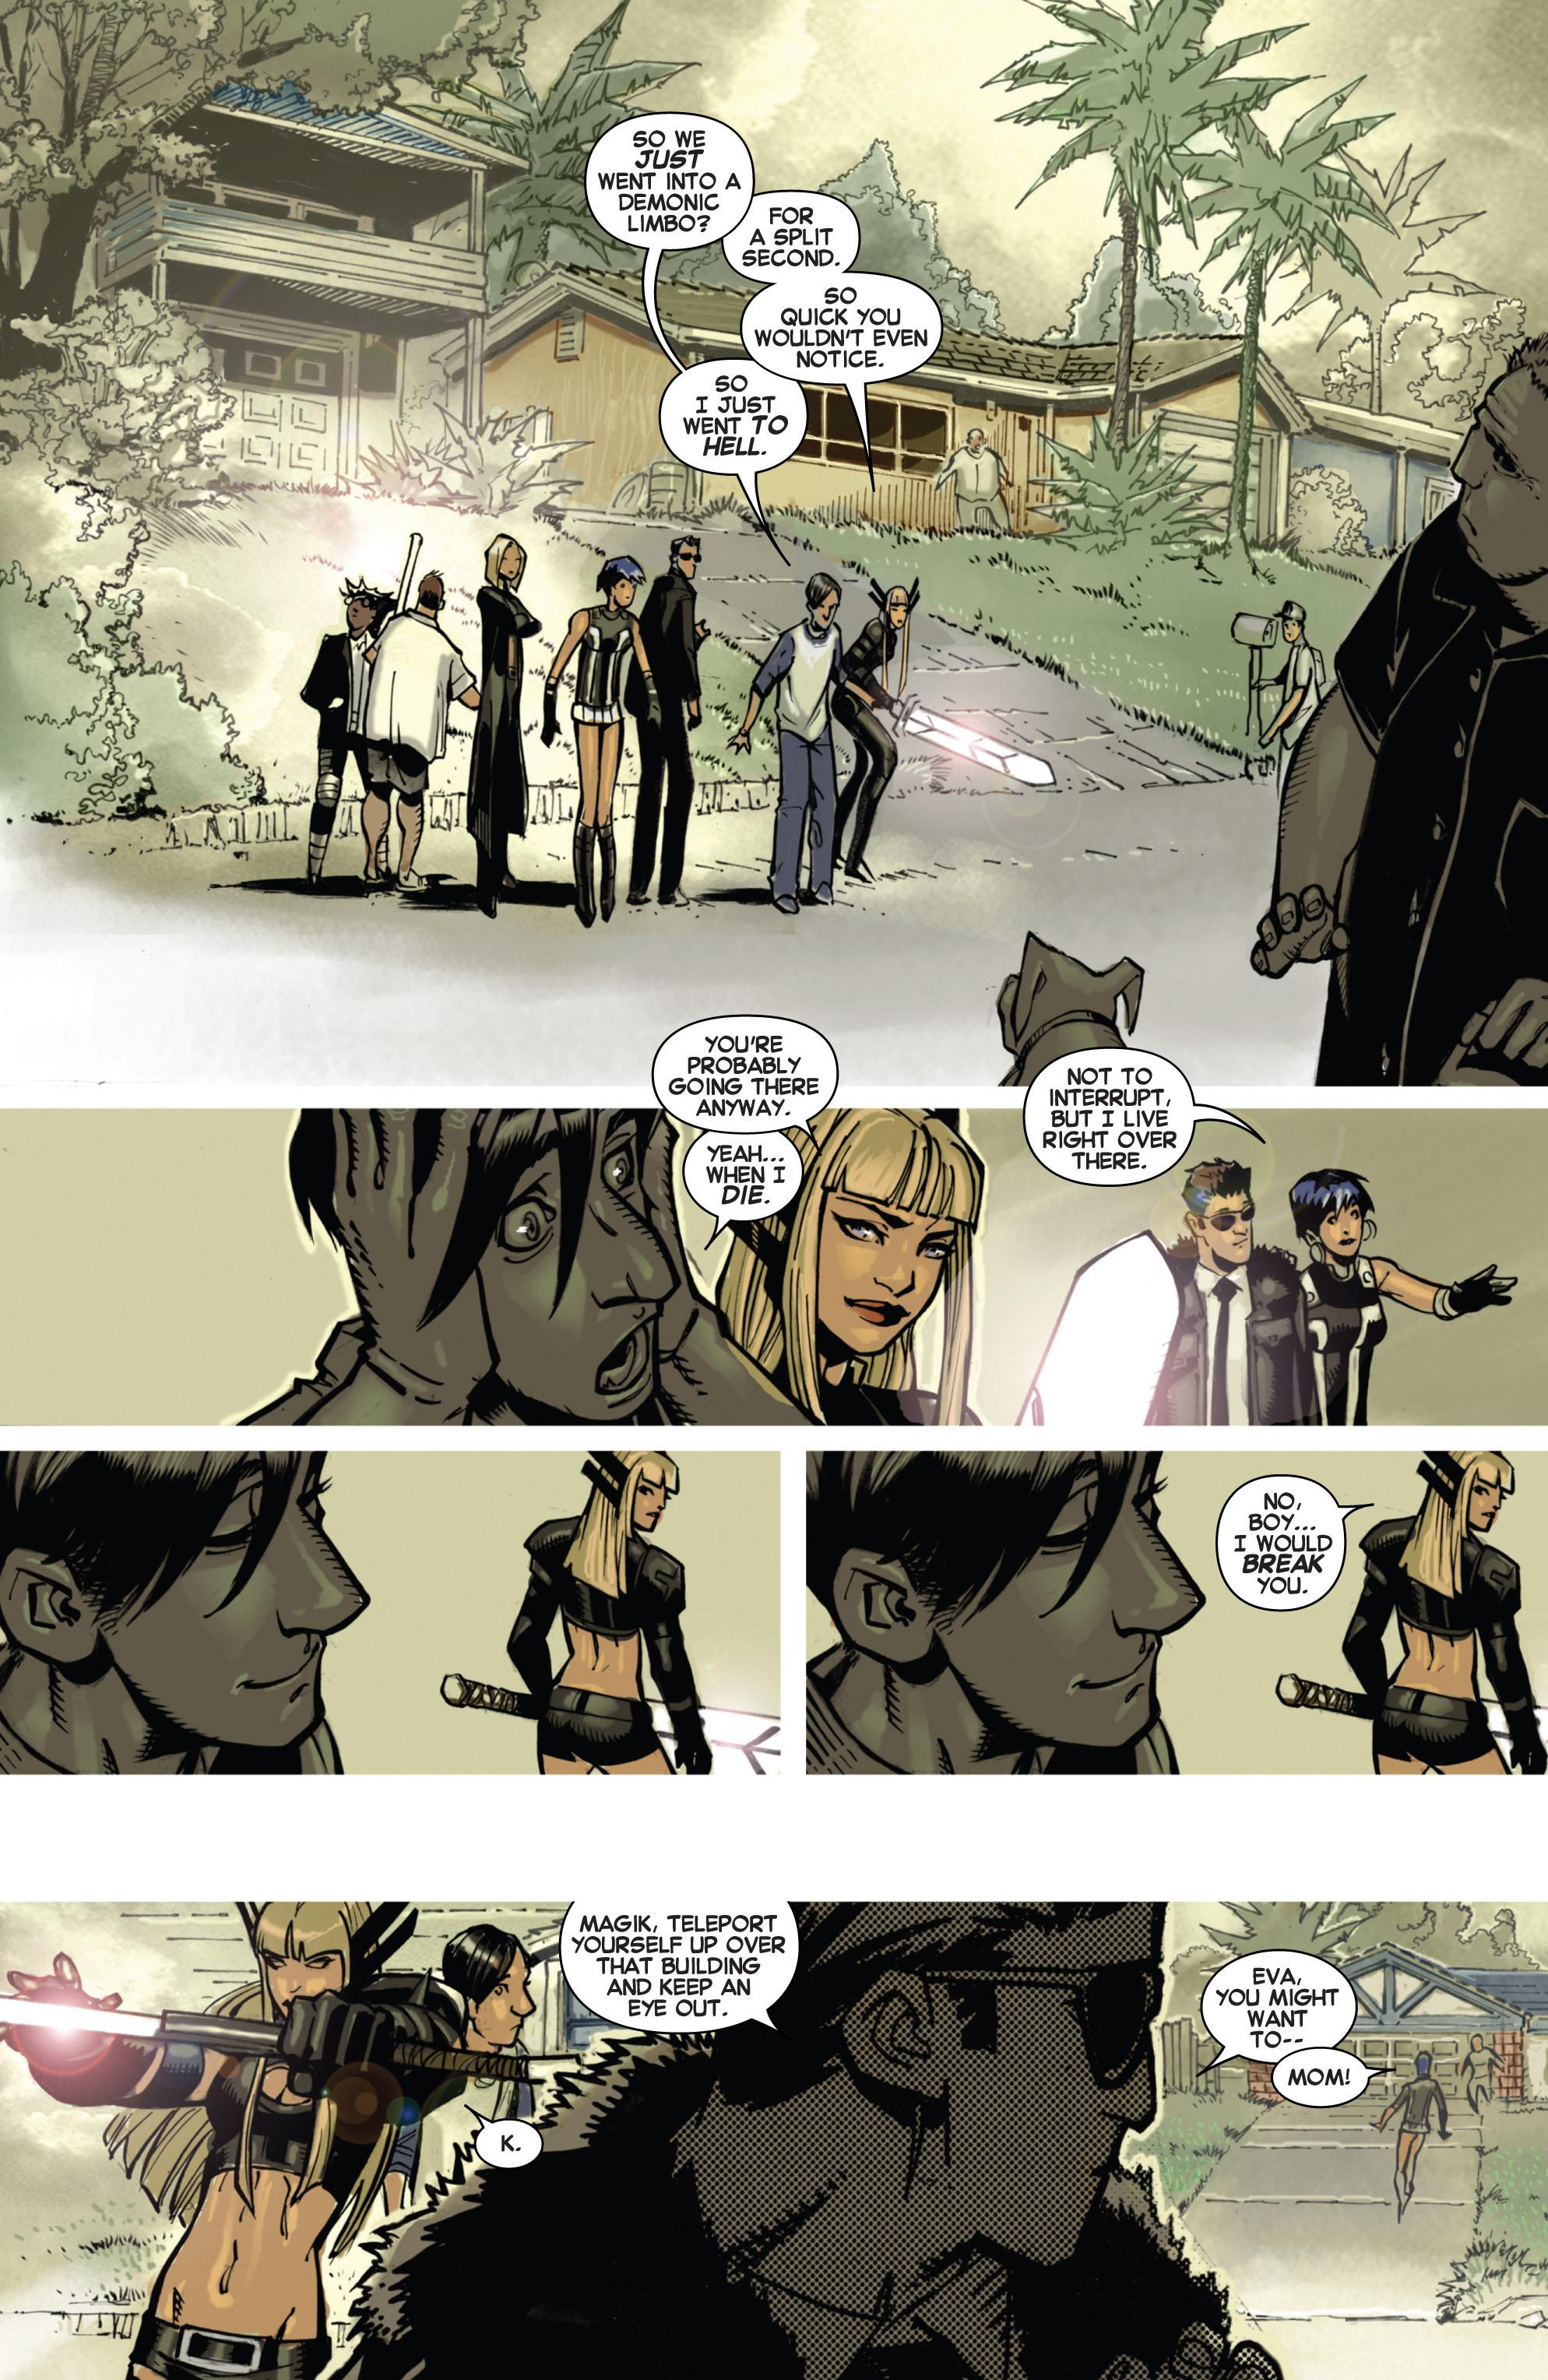 Read online Uncanny X-Men (2013) comic -  Issue # _TPB 1 - Revolution - 41